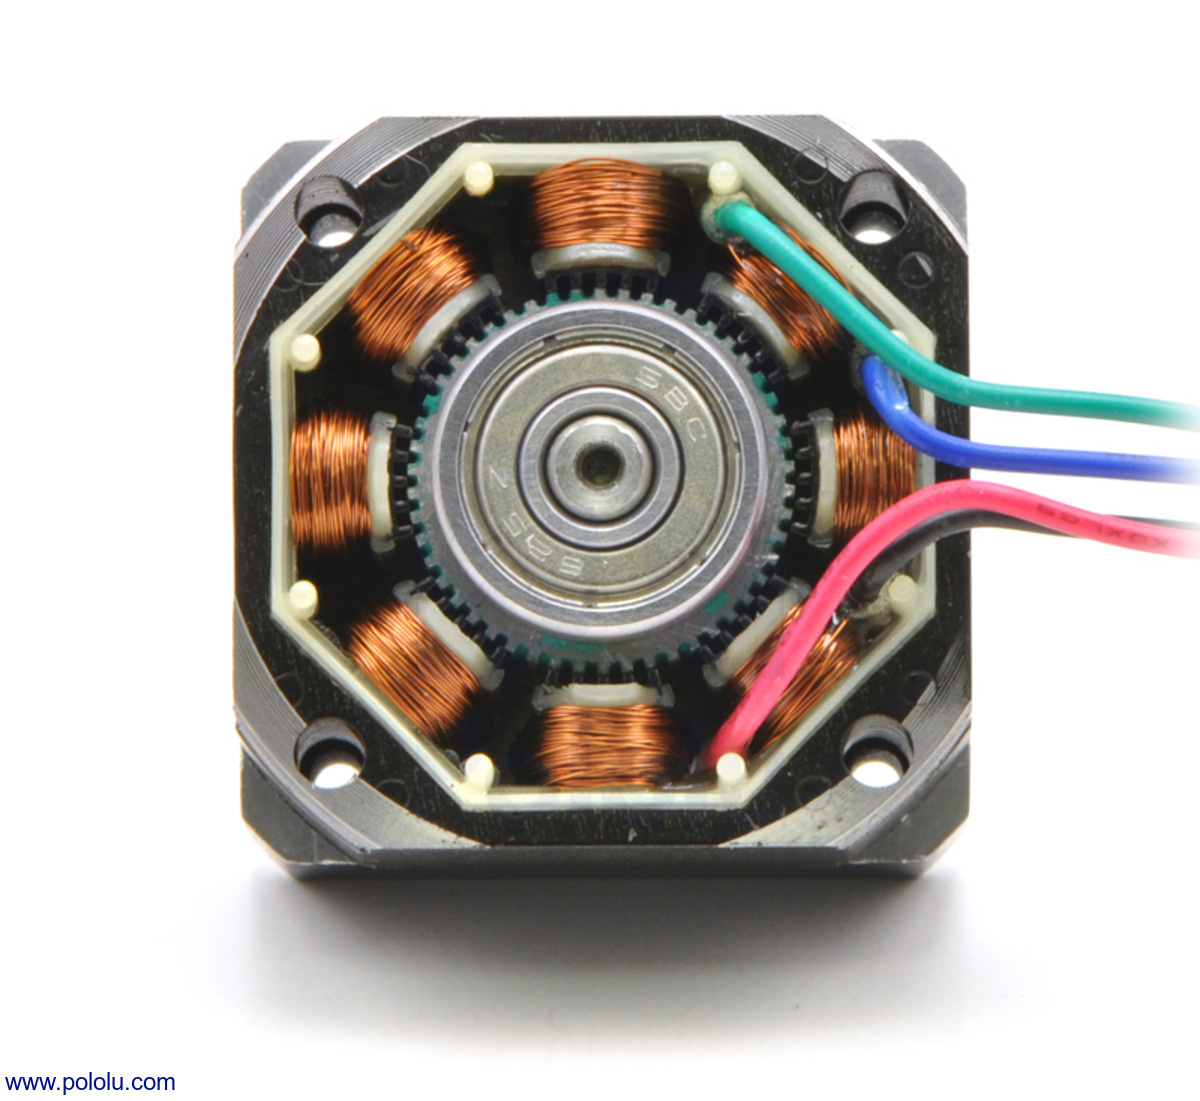 6 lead 3 phase motor wiring diagram ford taurus pololu - stepper motor: bipolar, 200 steps/rev, 28×32mm, 3.8v, 0.67 a/phase